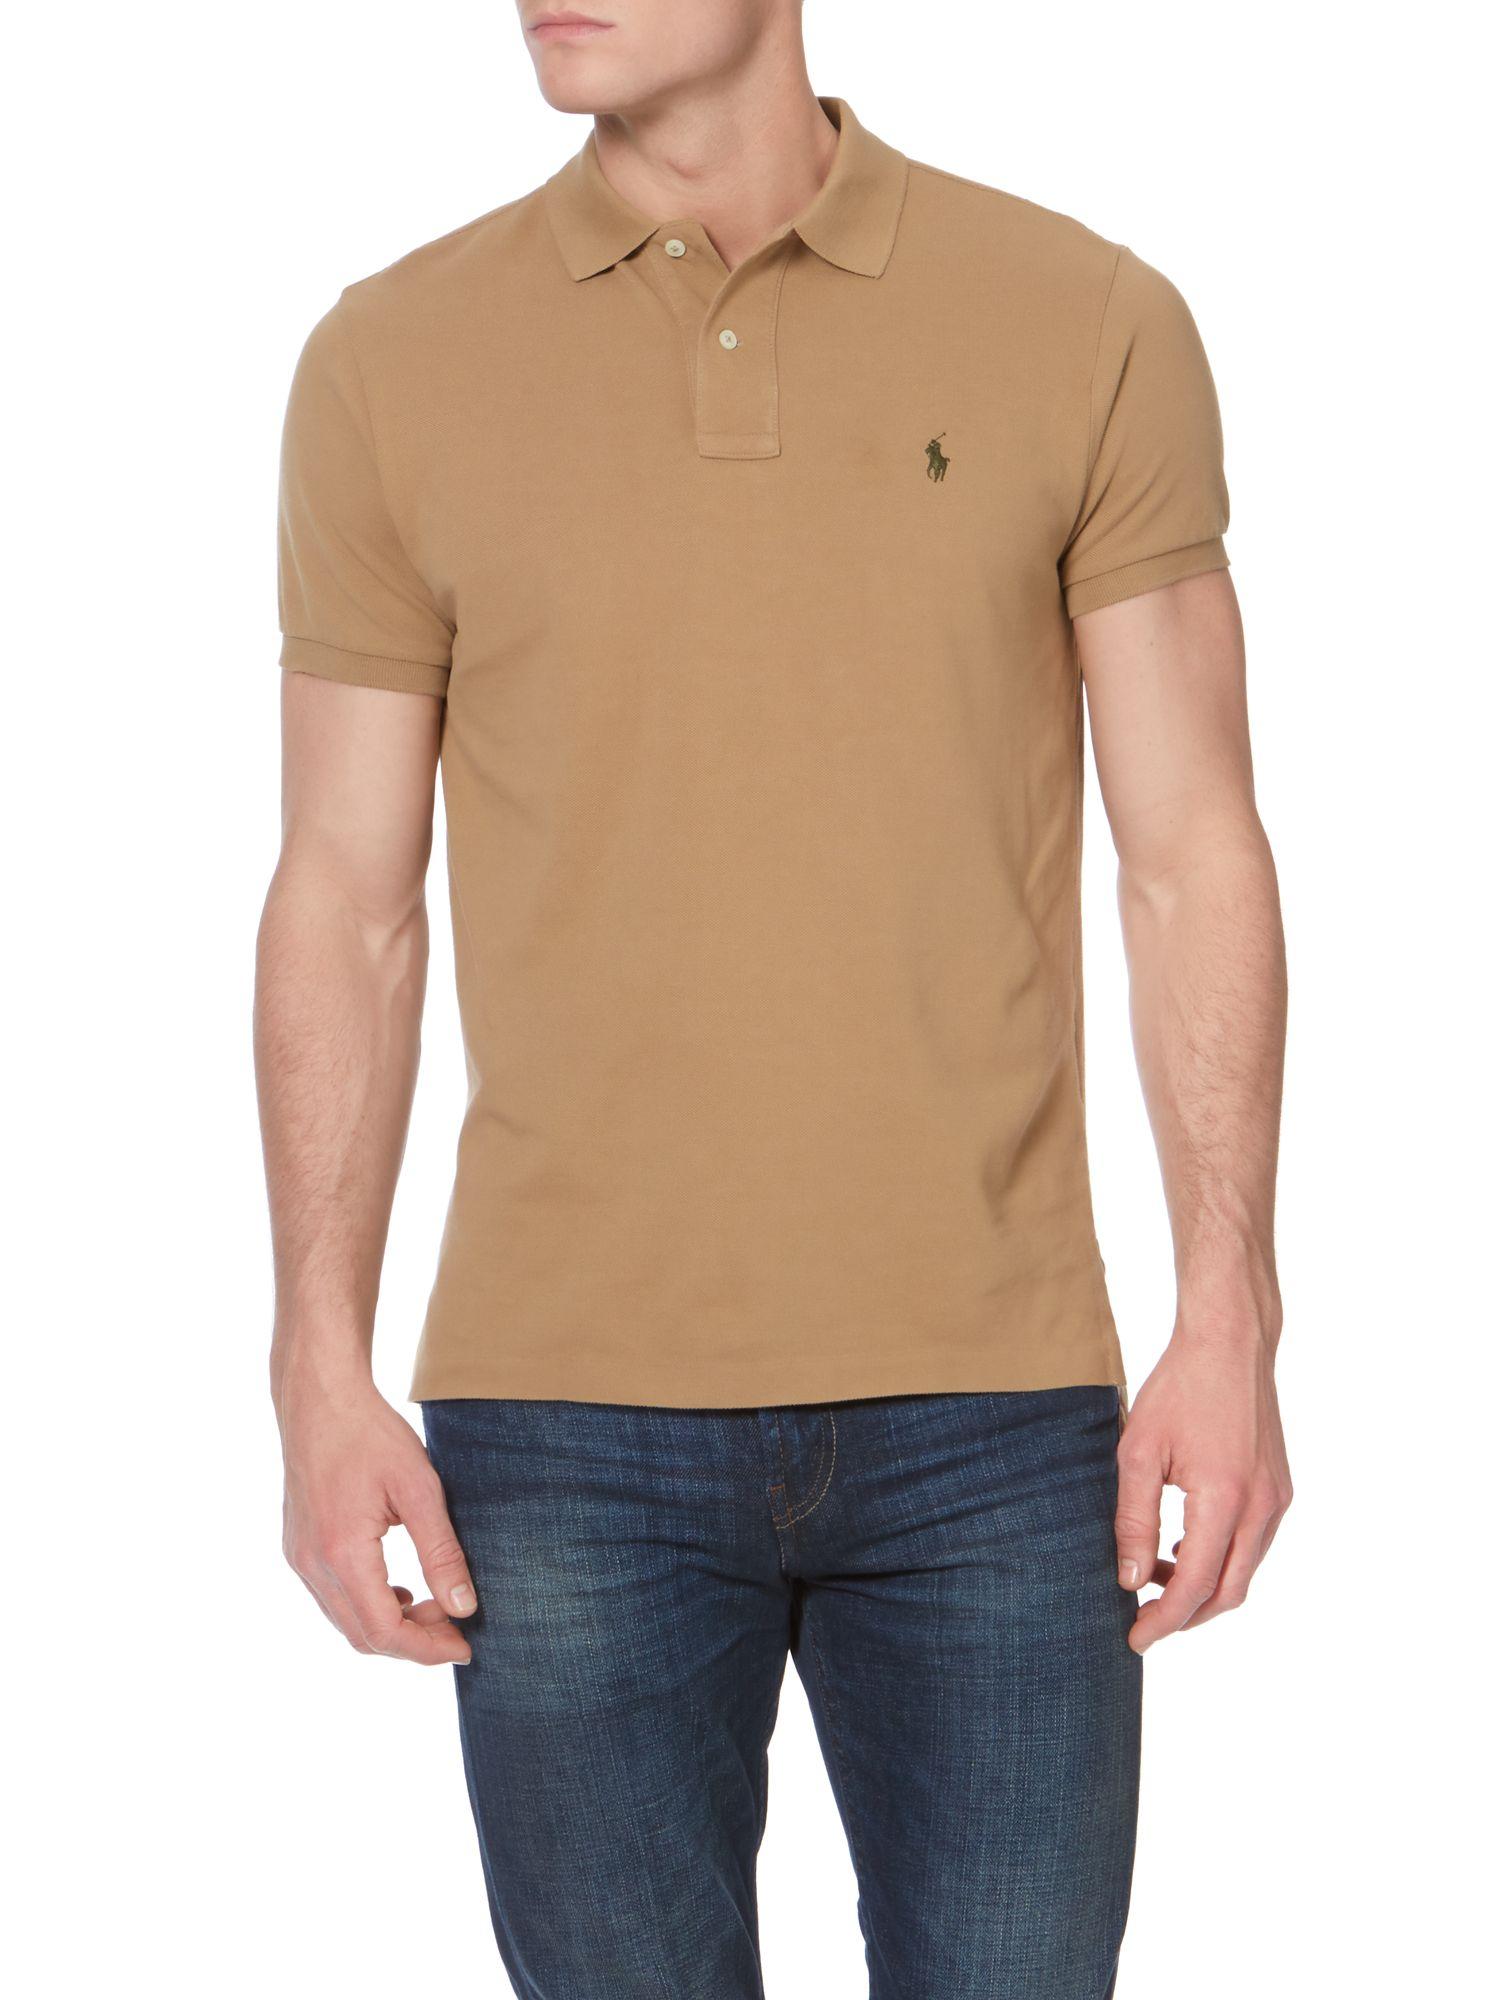 Polo Ralph Lauren Custom Fit Mesh Polo Shirt In Natural